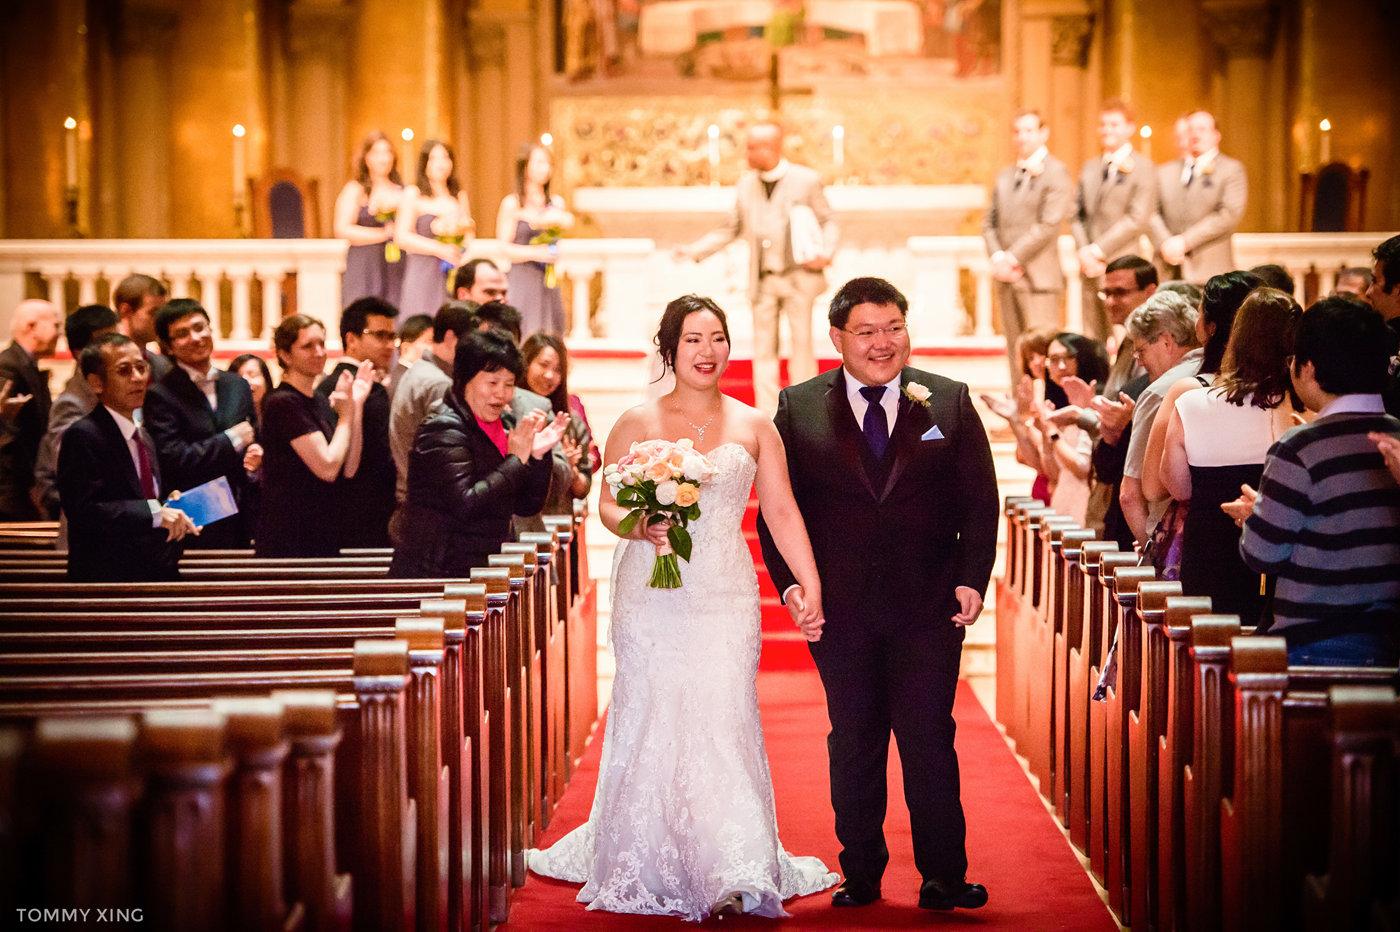 STANFORD MEMORIAL CHURCH WEDDING - Wenjie & Chengcheng - SAN FRANCISCO BAY AREA 斯坦福教堂婚礼跟拍 - 洛杉矶婚礼婚纱照摄影师 Tommy Xing Photography122.jpg